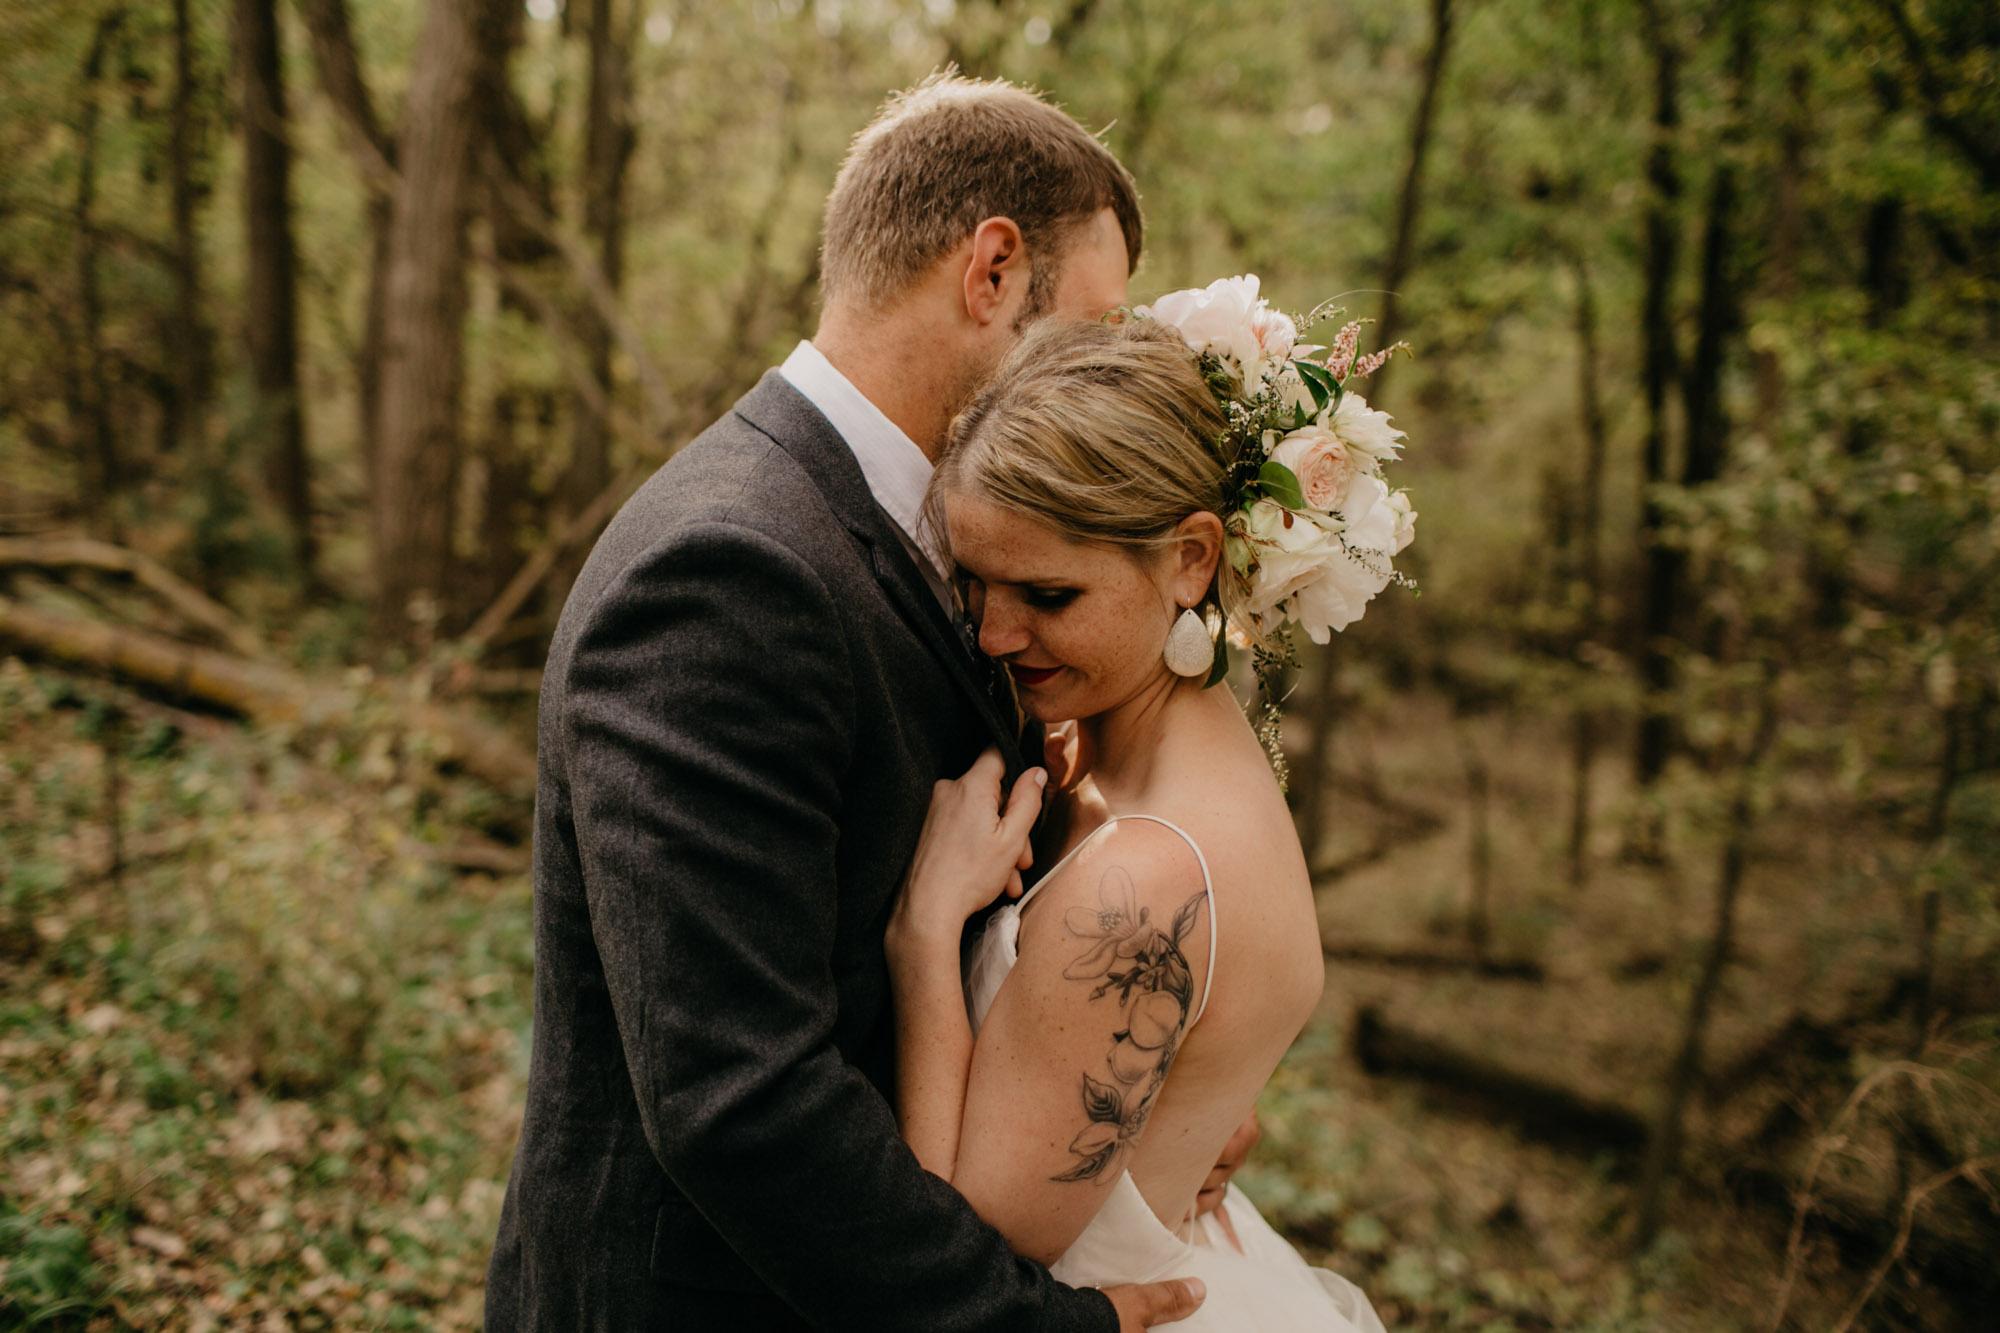 omaha-wedding-photographer-meghan-time-36.jpg